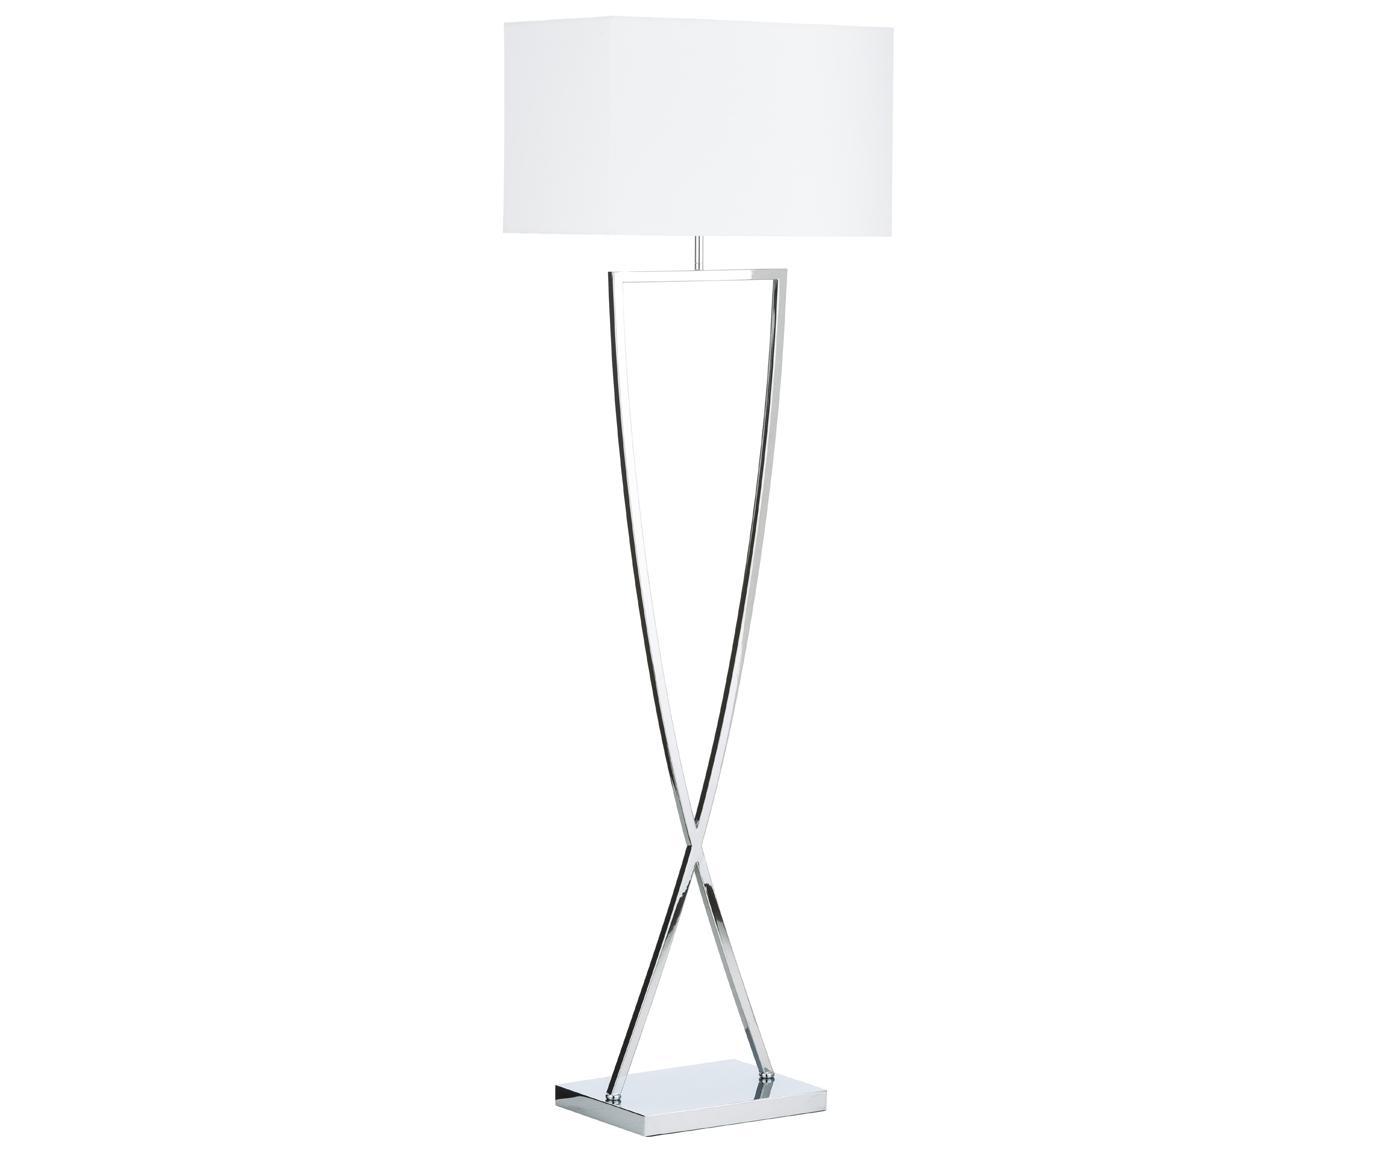 Stehlampe Toulouse in Silber, Lampenfuß: Metall, verchromt, Lampenschirm: Textil, Chrom, Weiß, 50 x 157 cm